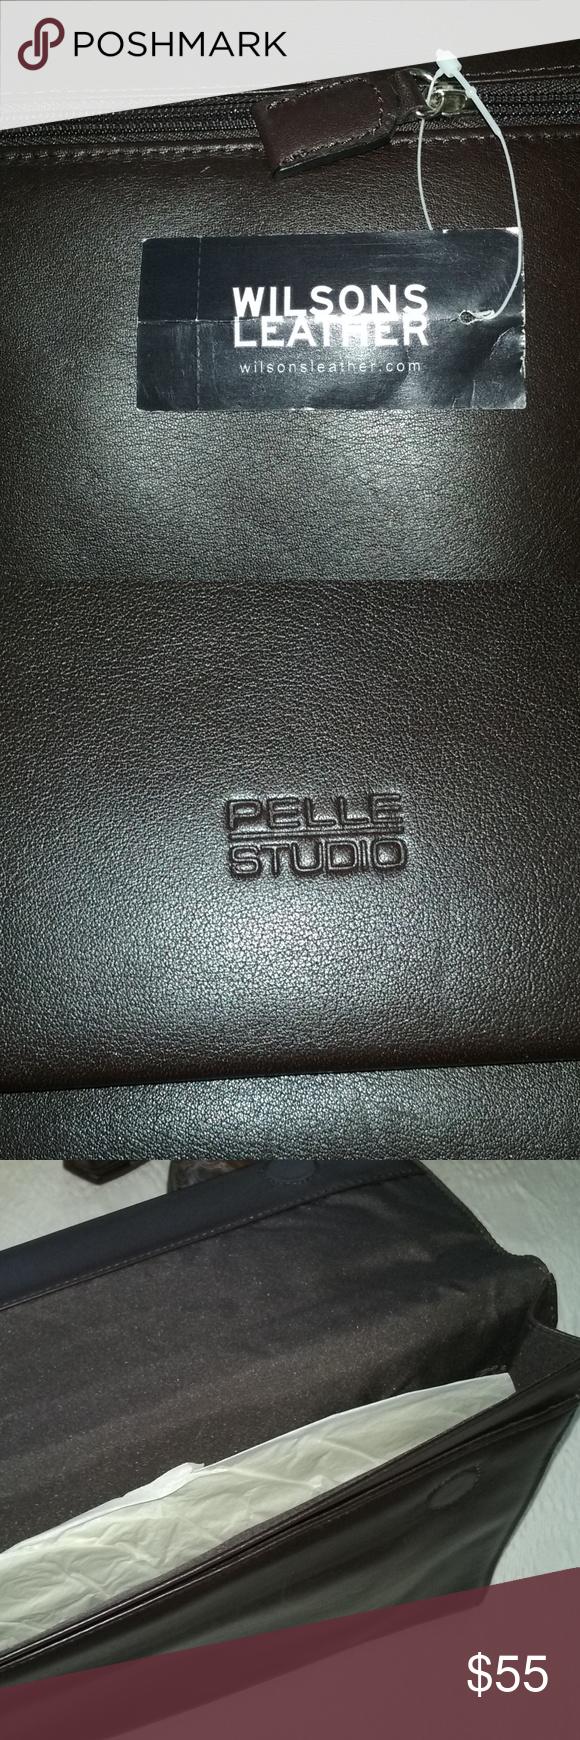 100 leather business portfolio/briefcase Very classy